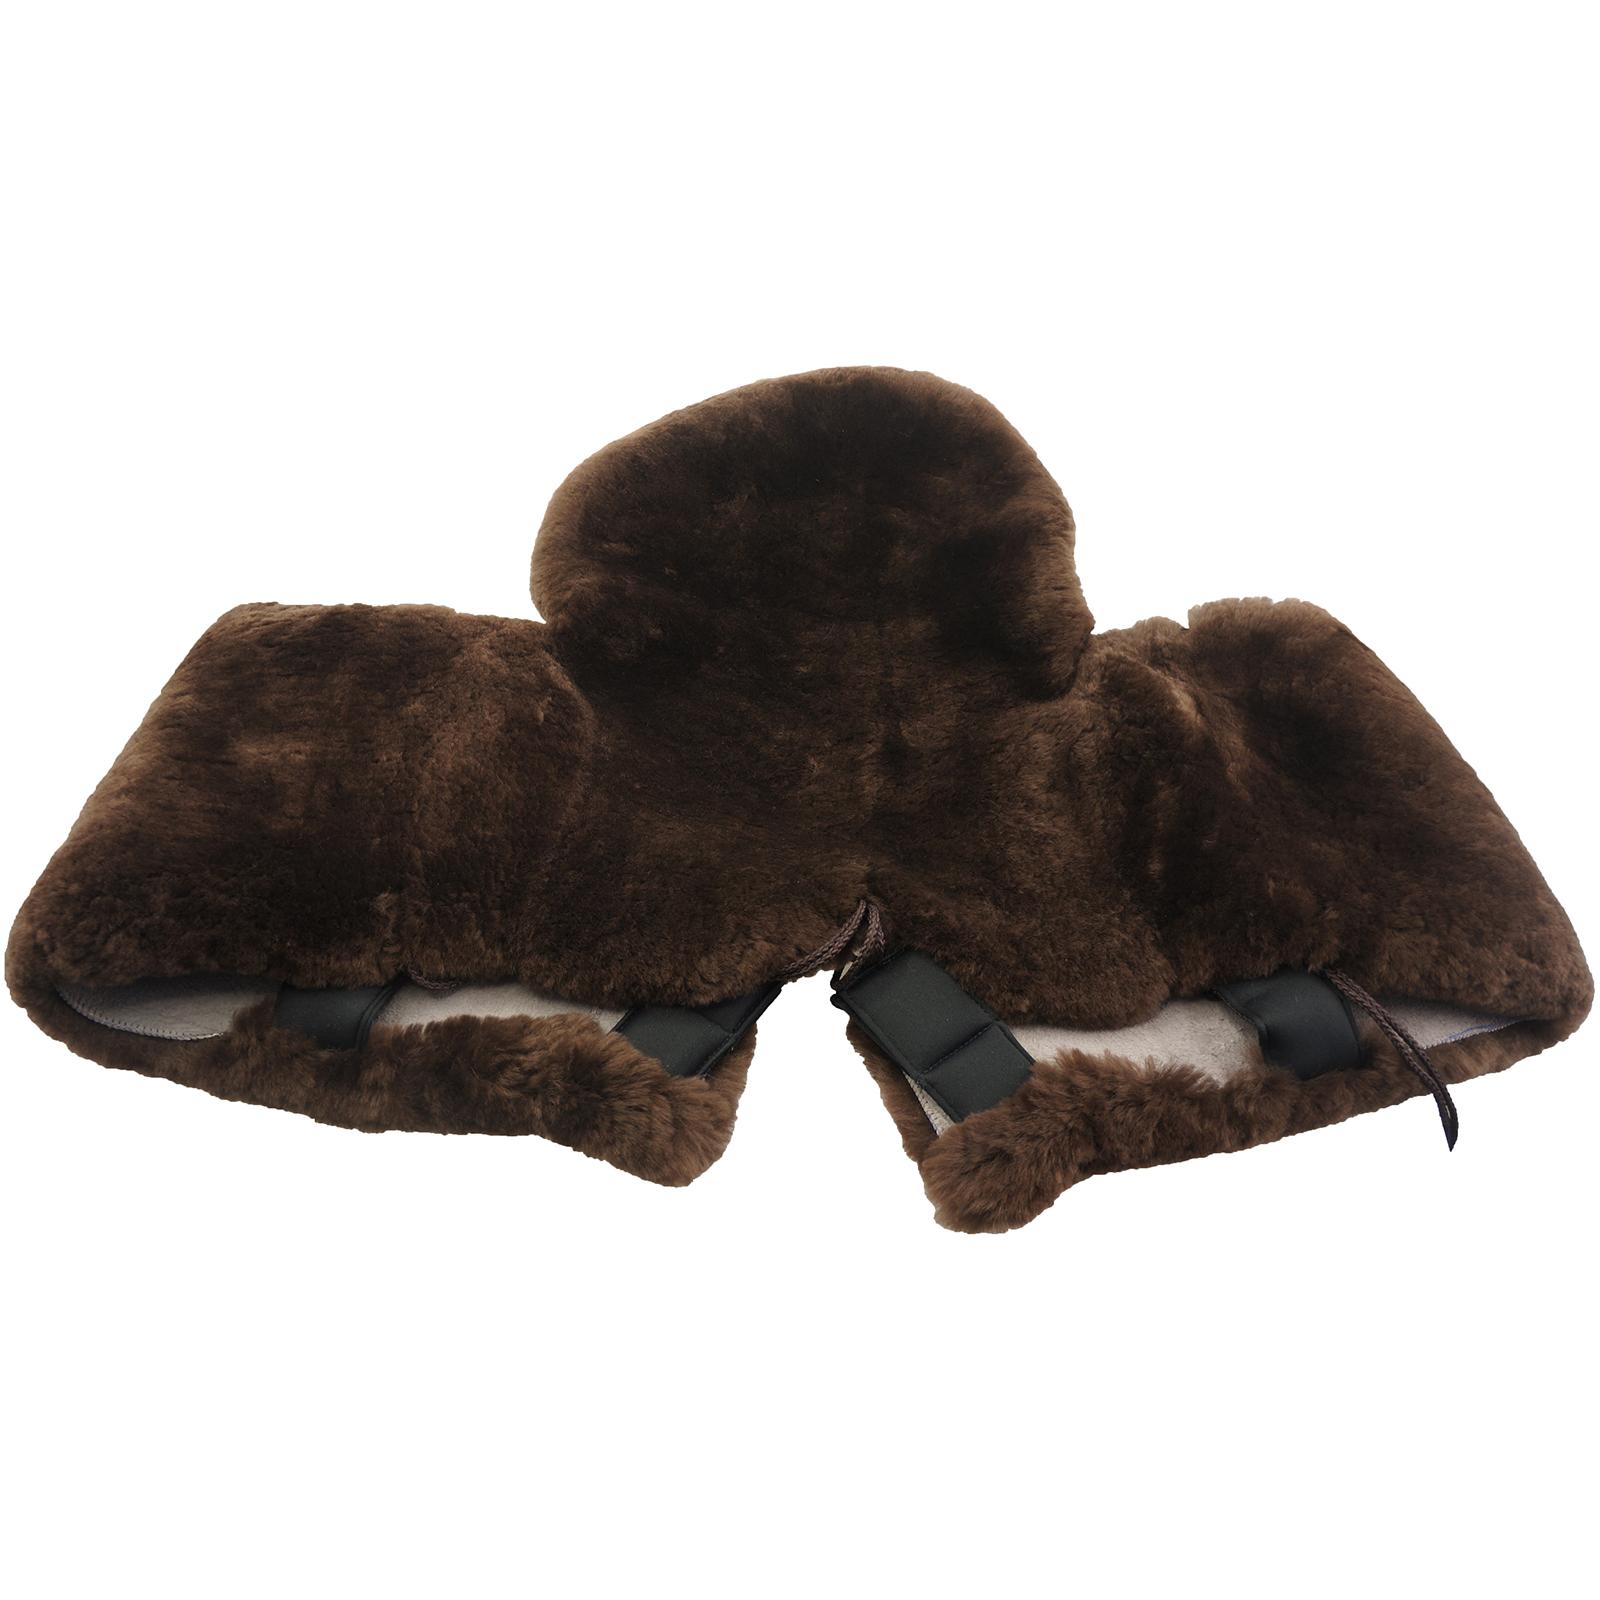 Original Australian Merino Sheepskin Wool Pad Western Horse Saddle Seat Blanket